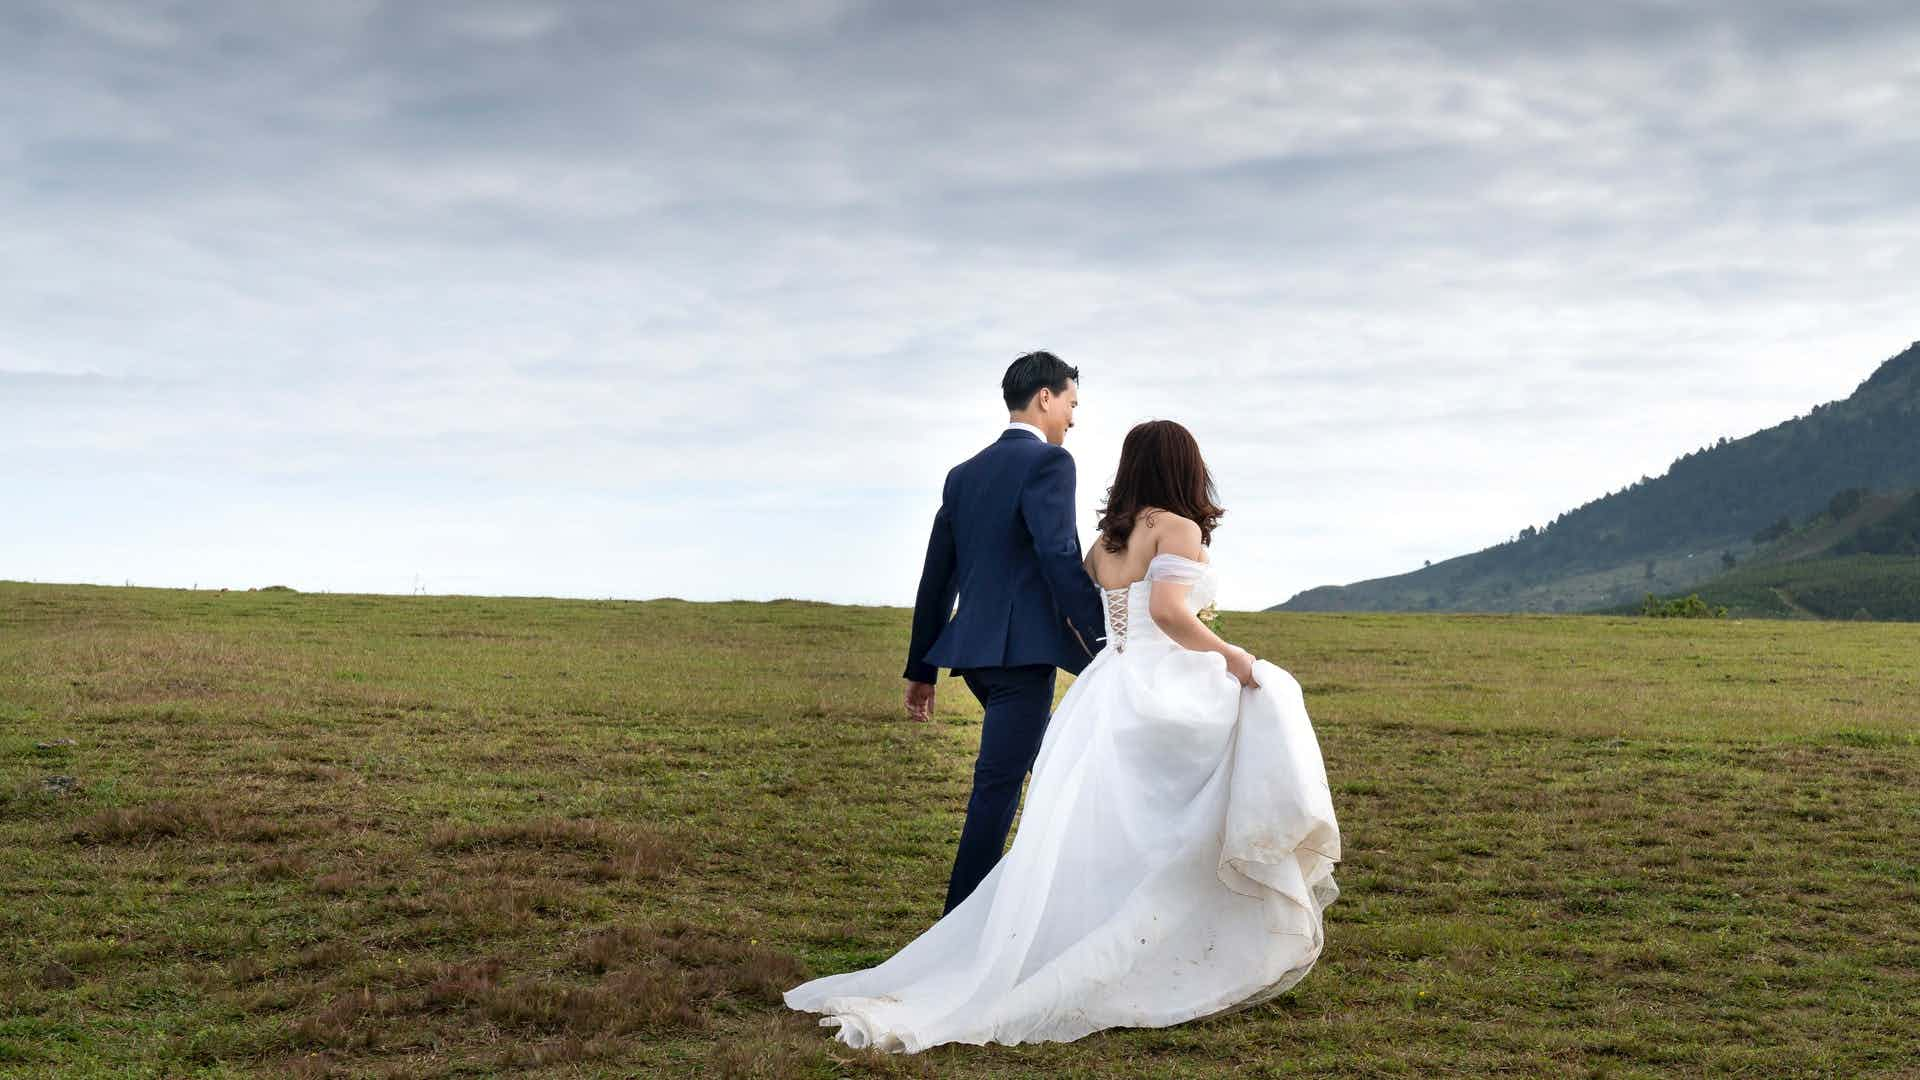 photojournalisme mariage, photographie mariage, vidéaste mariage